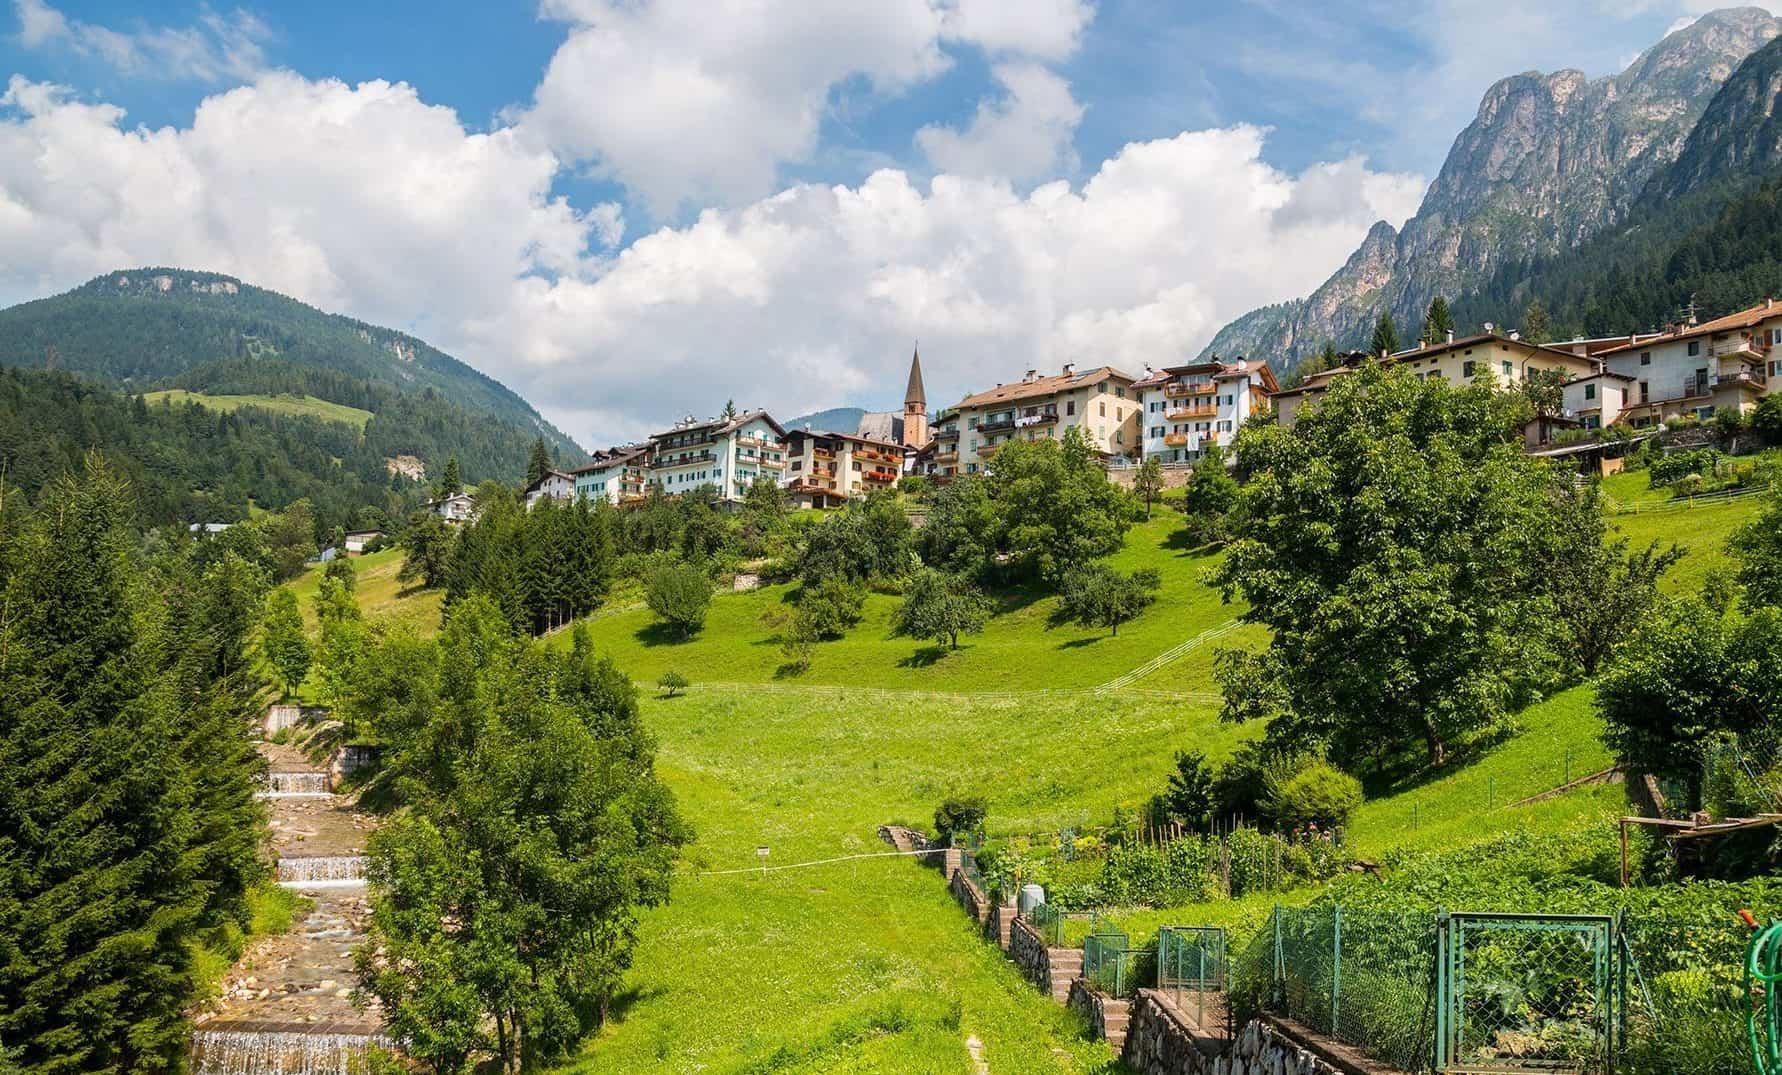 Tesero - © Vaghis - viaggi & turismo Italia Tutti i diritti riservati